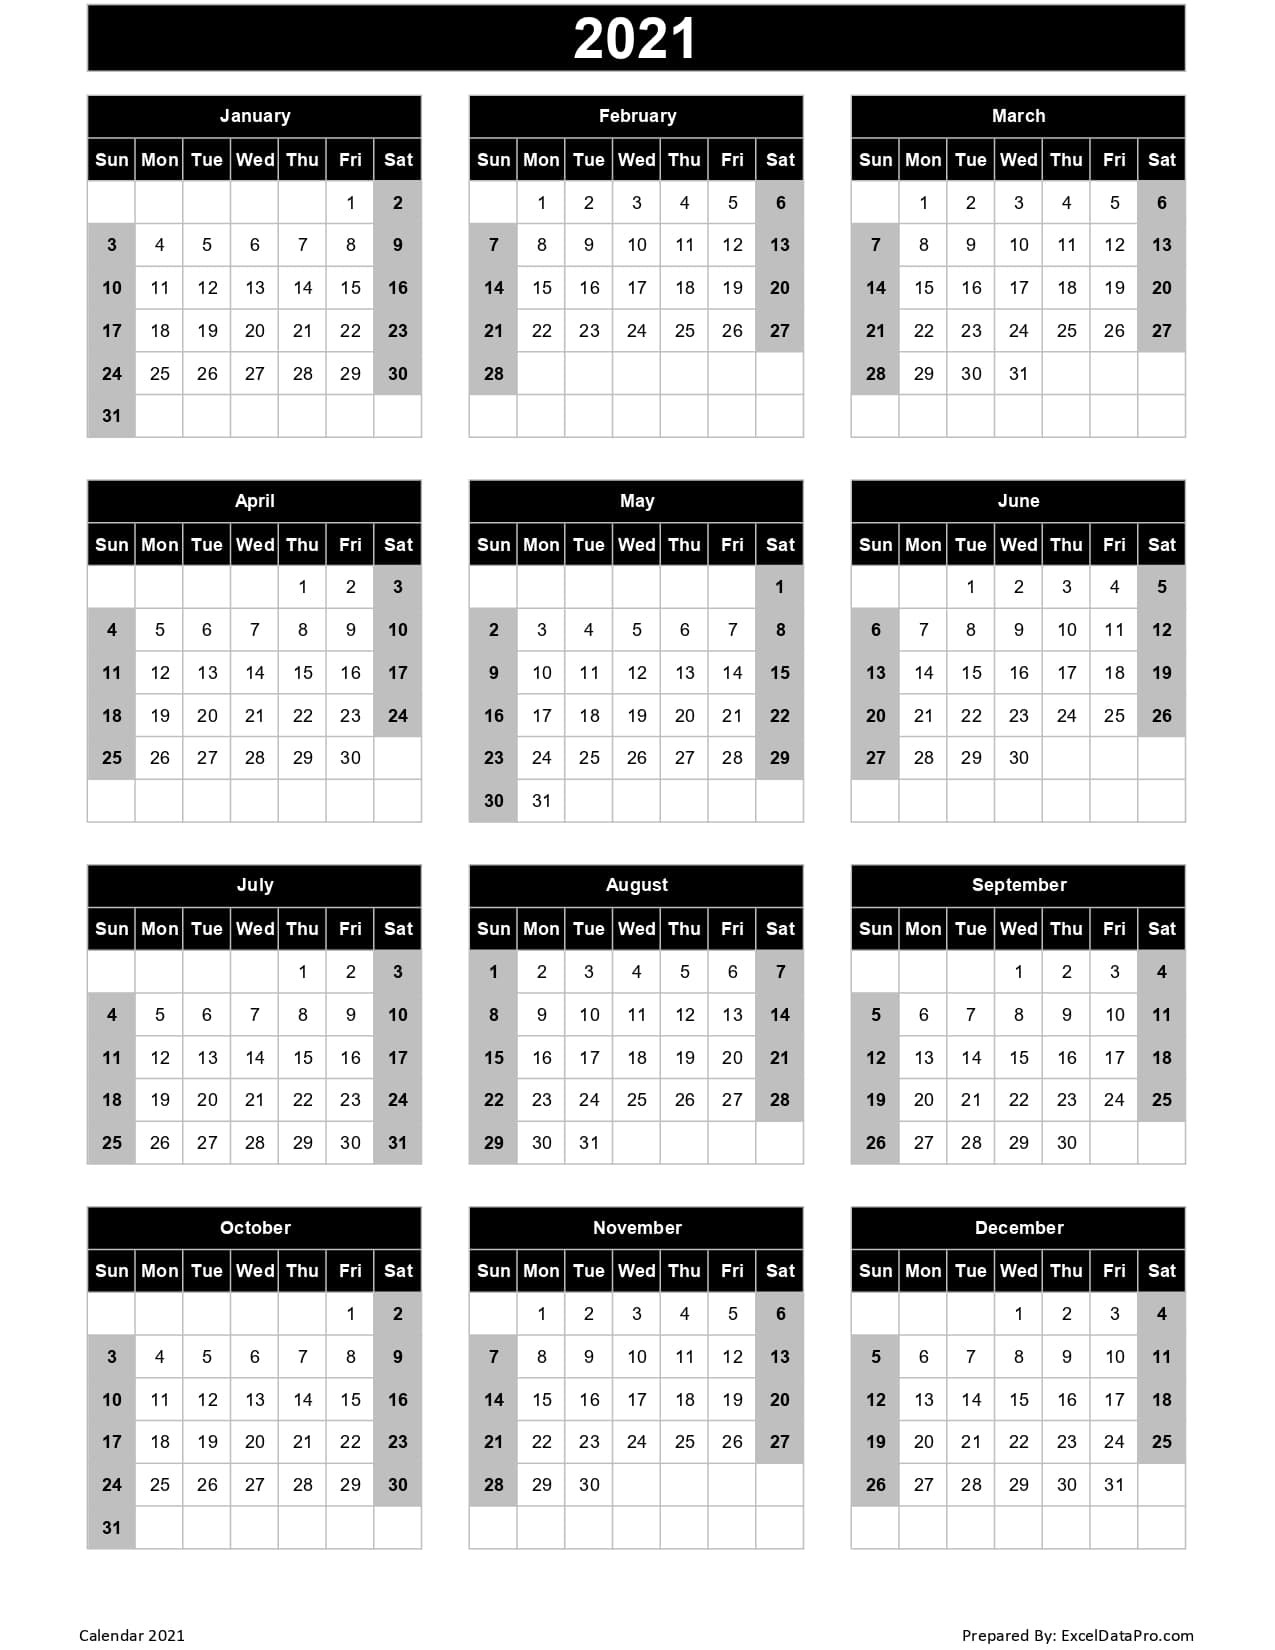 Calendar 2021 Excel Templates, Printable Pdfs & Images  Printable 2021 2021 Depo Calendar